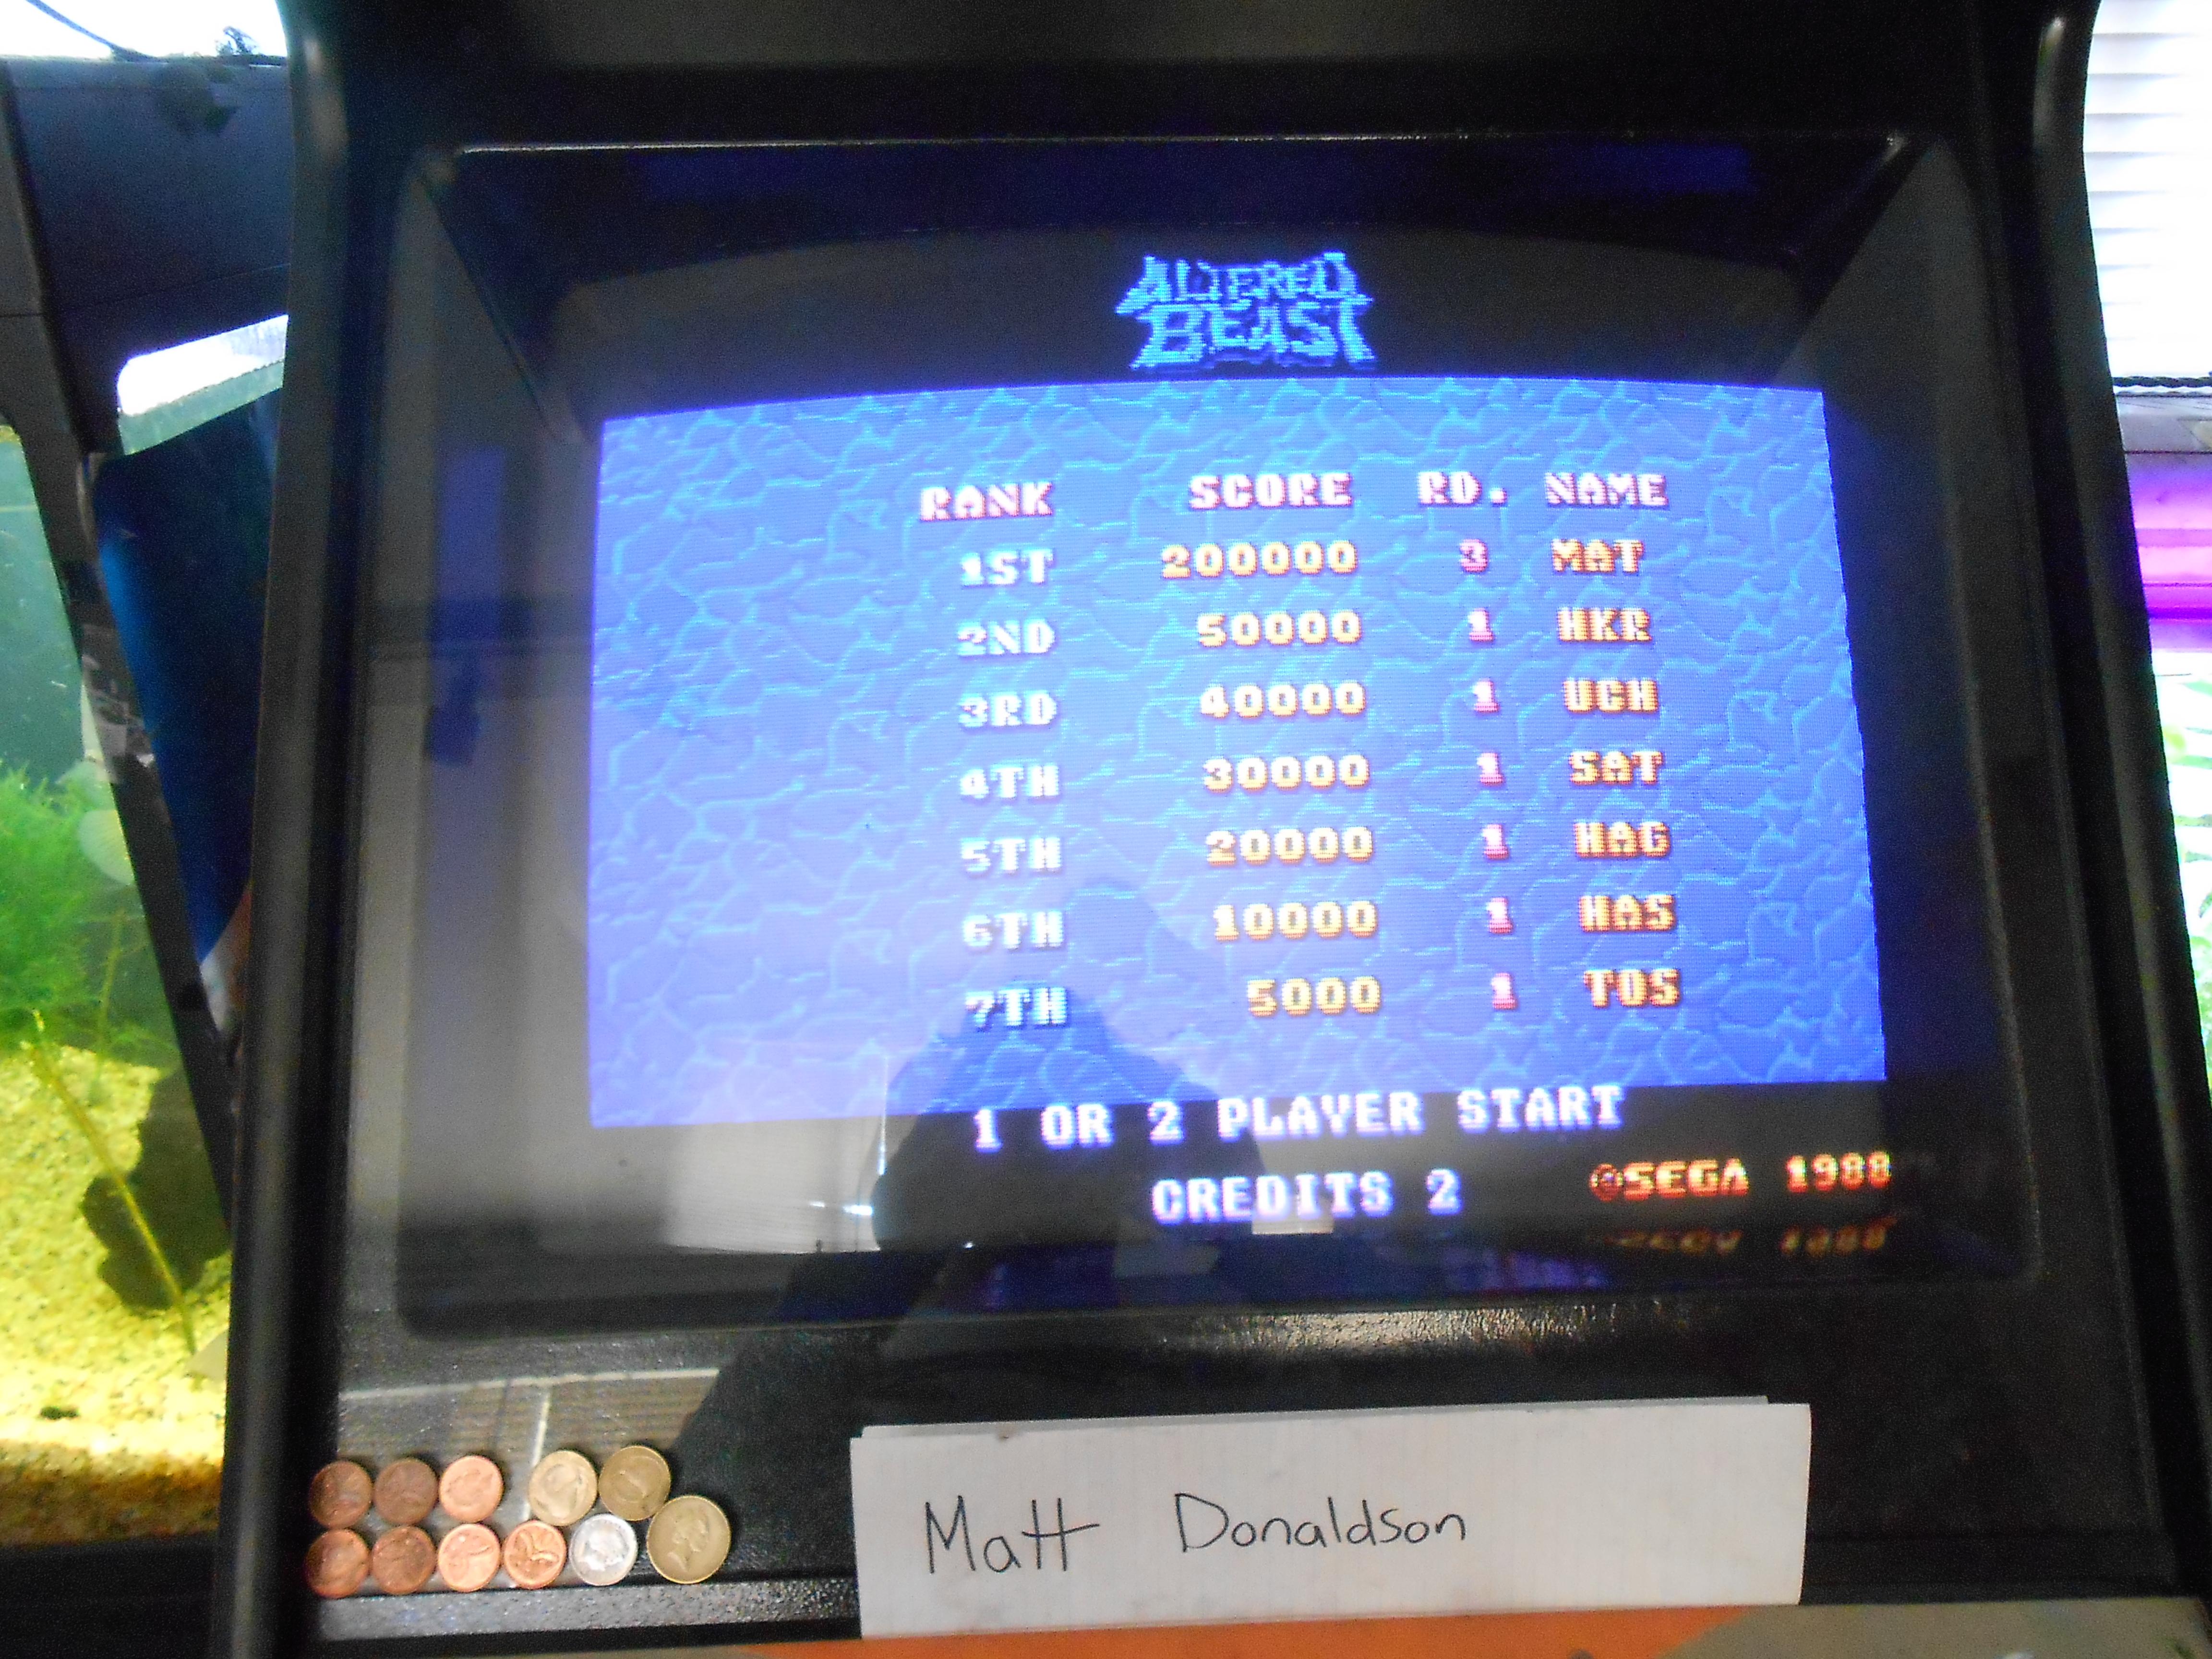 MattDonaldson: Altered Beast [altbeast] (Arcade Emulated / M.A.M.E.) 200,000 points on 2014-06-03 22:40:11